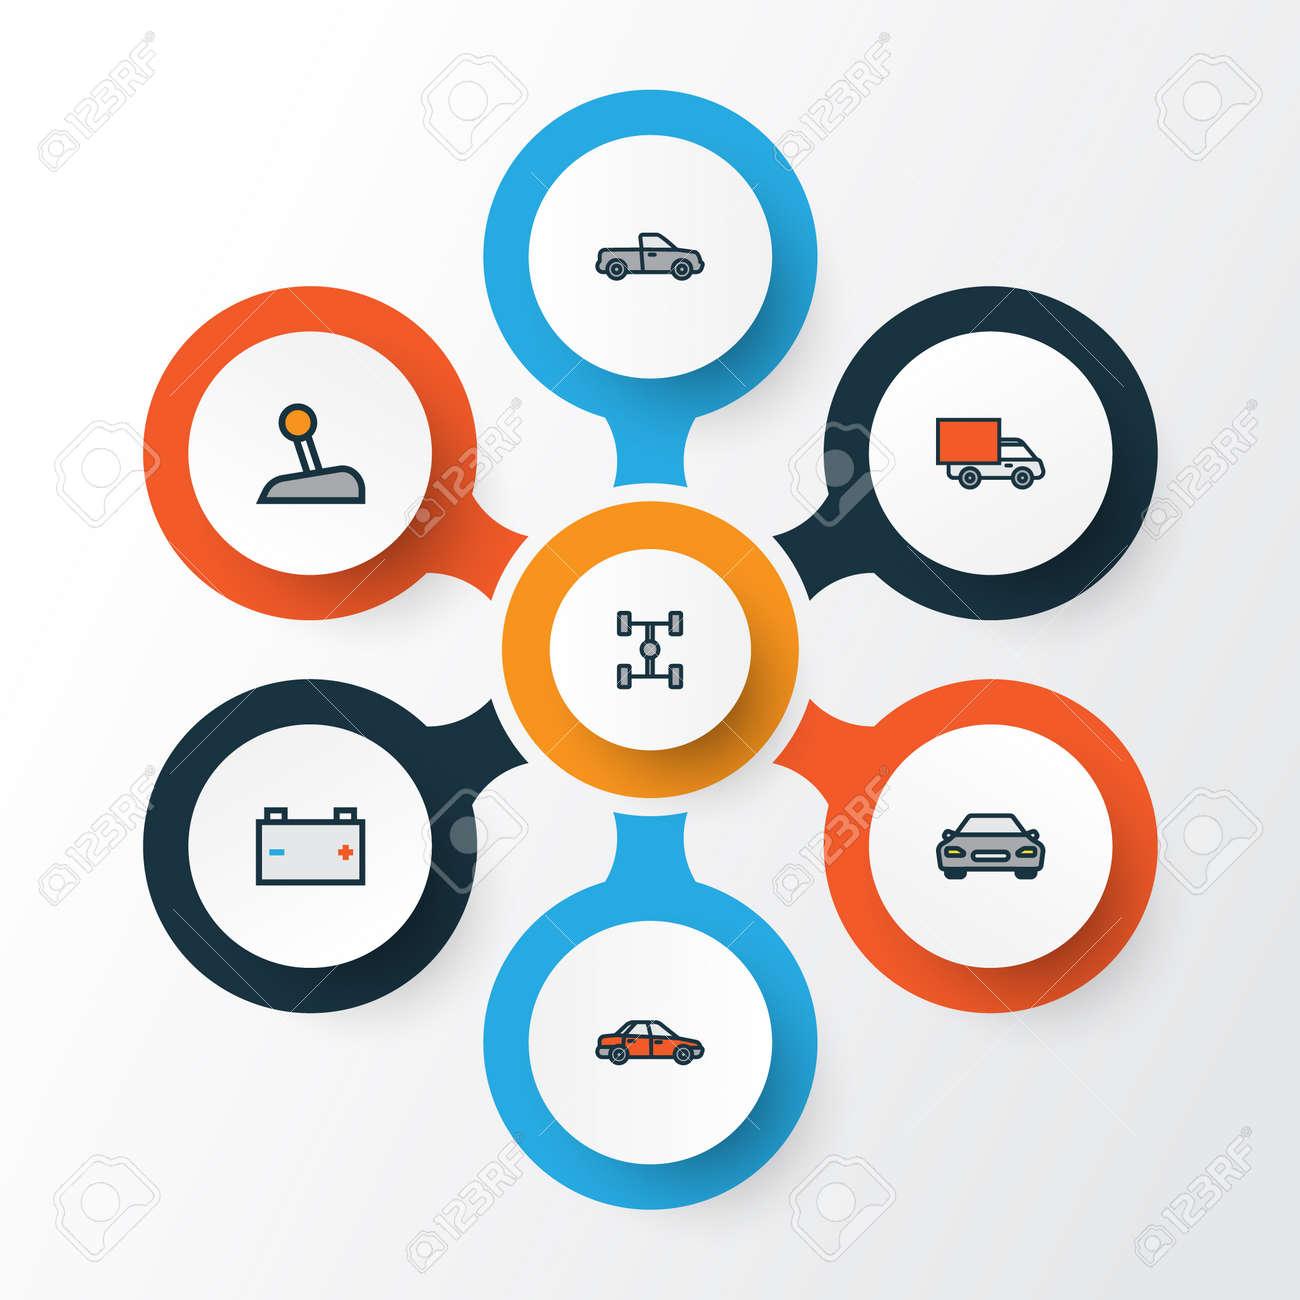 Car Colorful Outline Icons Set Collection Of Auto Automobile Van